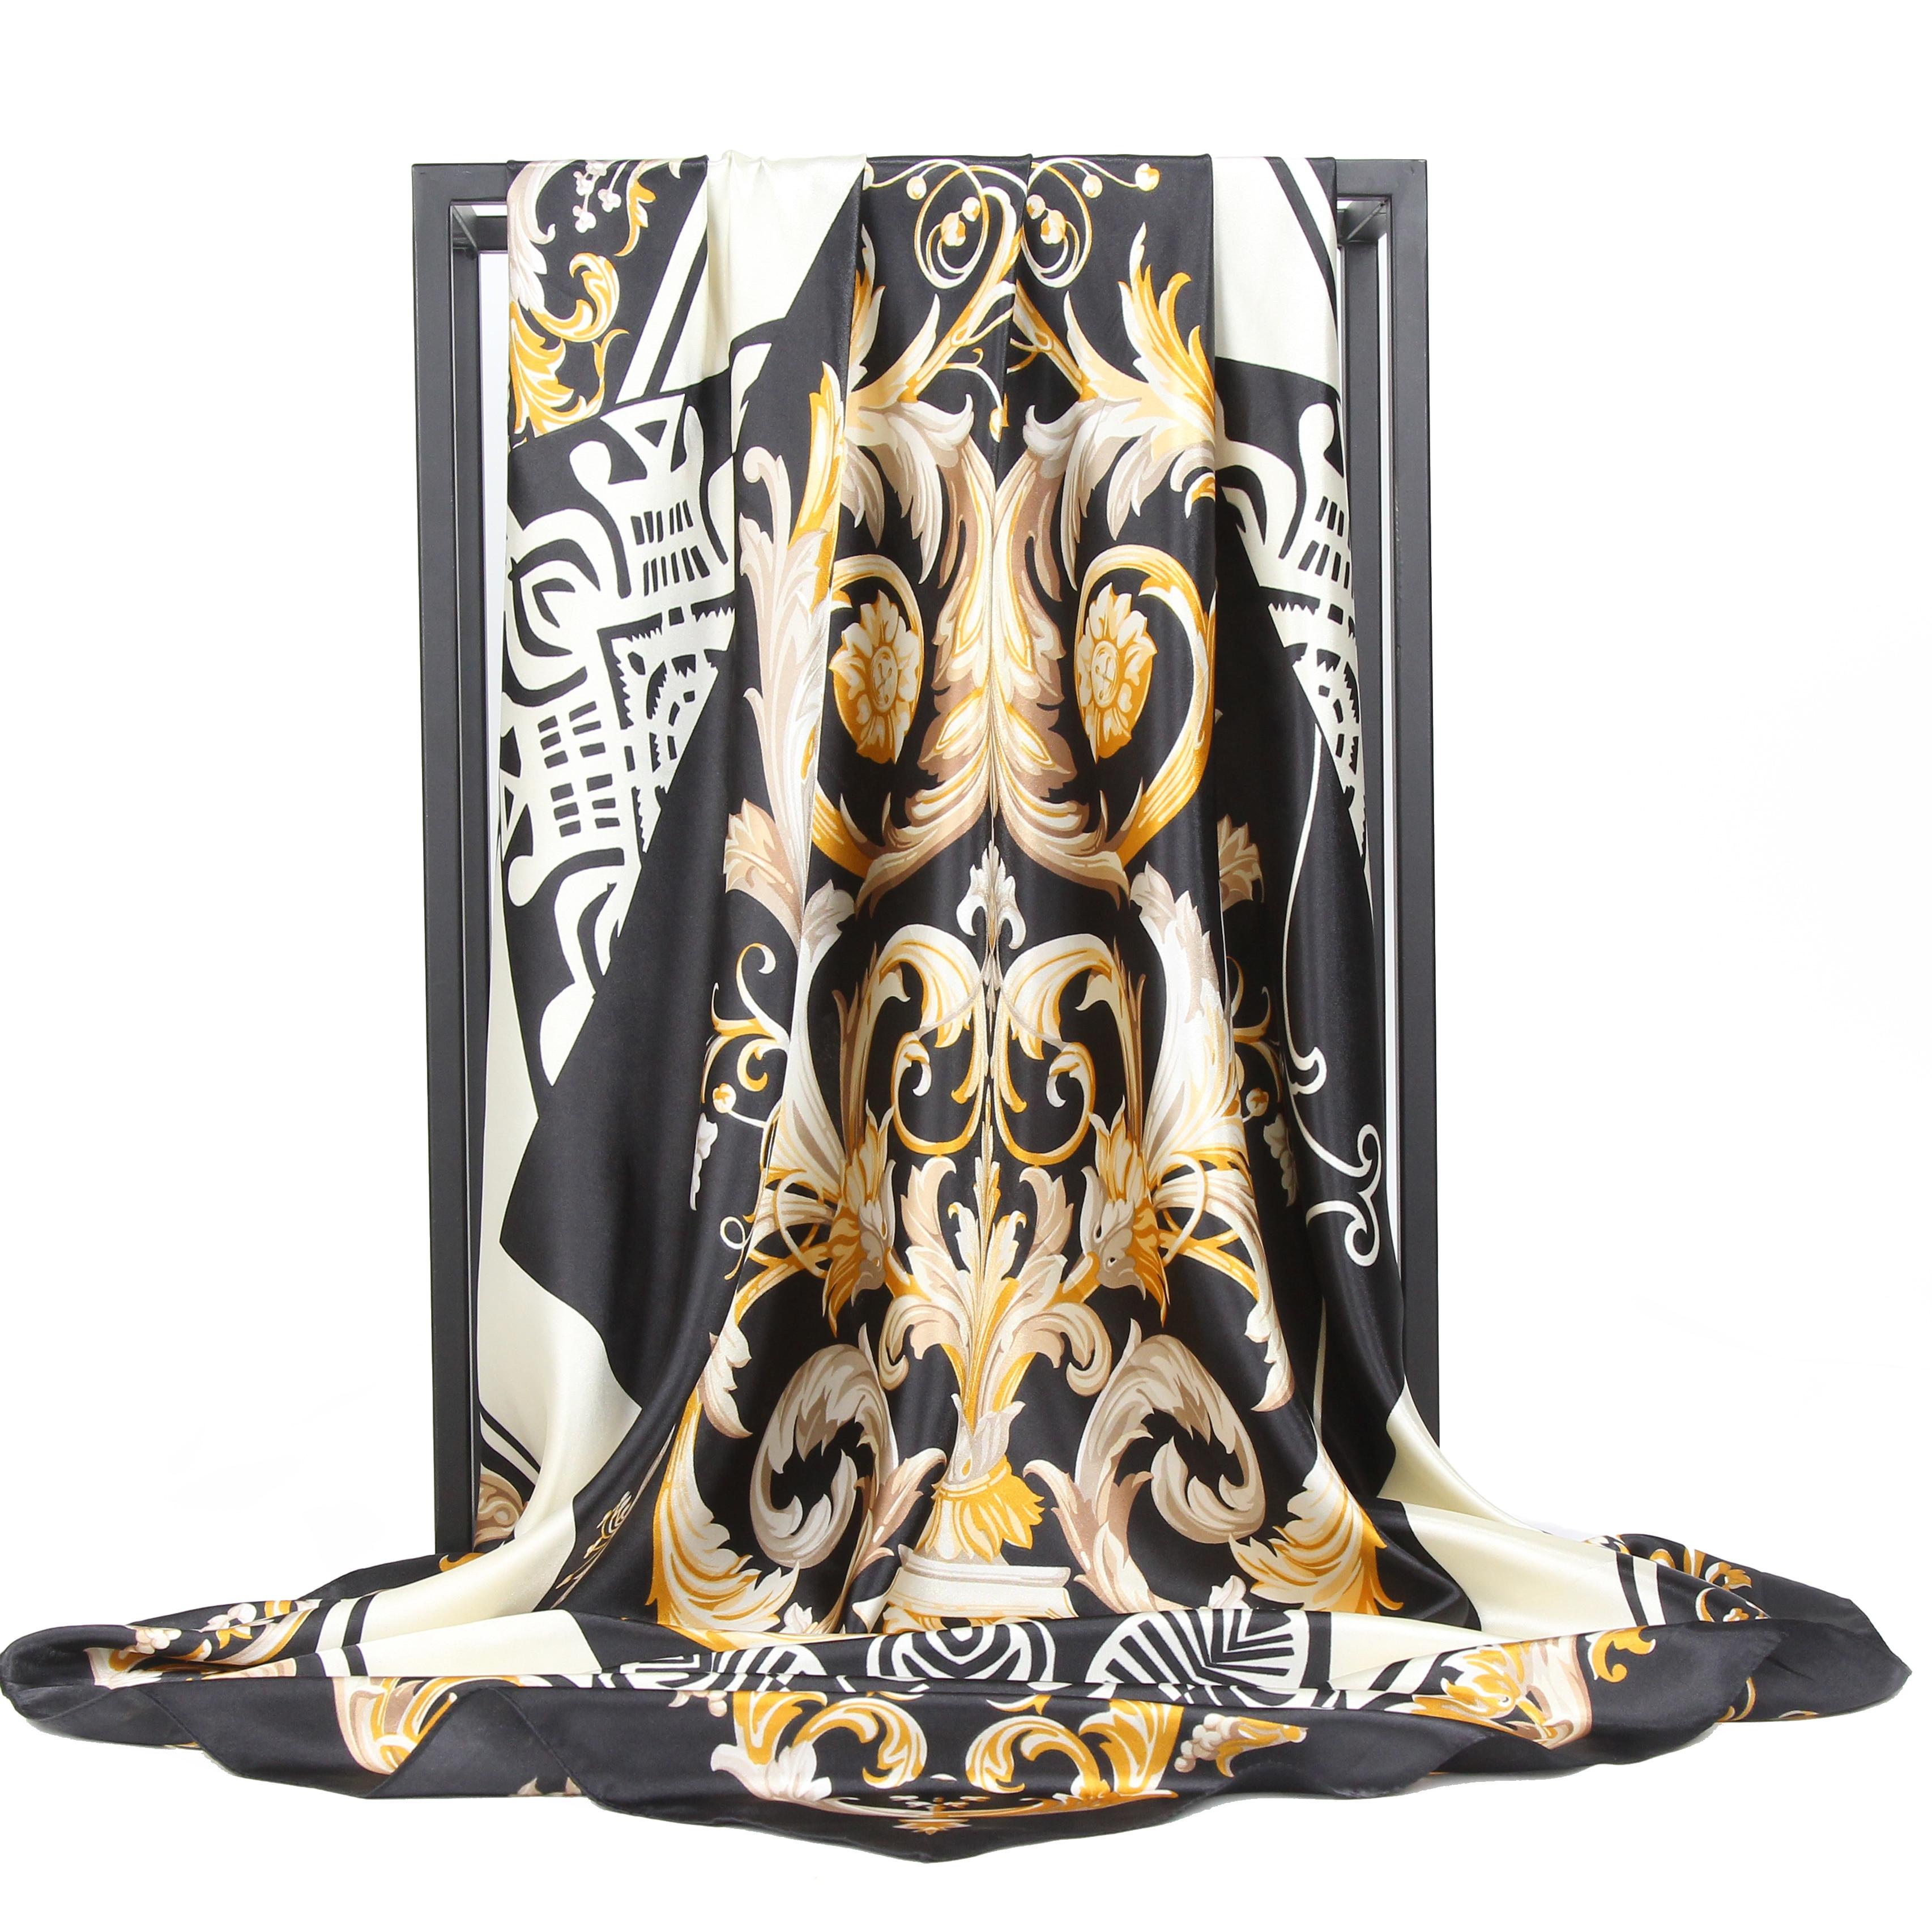 Silk Scarf Women Fashion Kerchief Satin Neck Print head/Hair Scarfs Female 90*90cm Shawls and Wraps